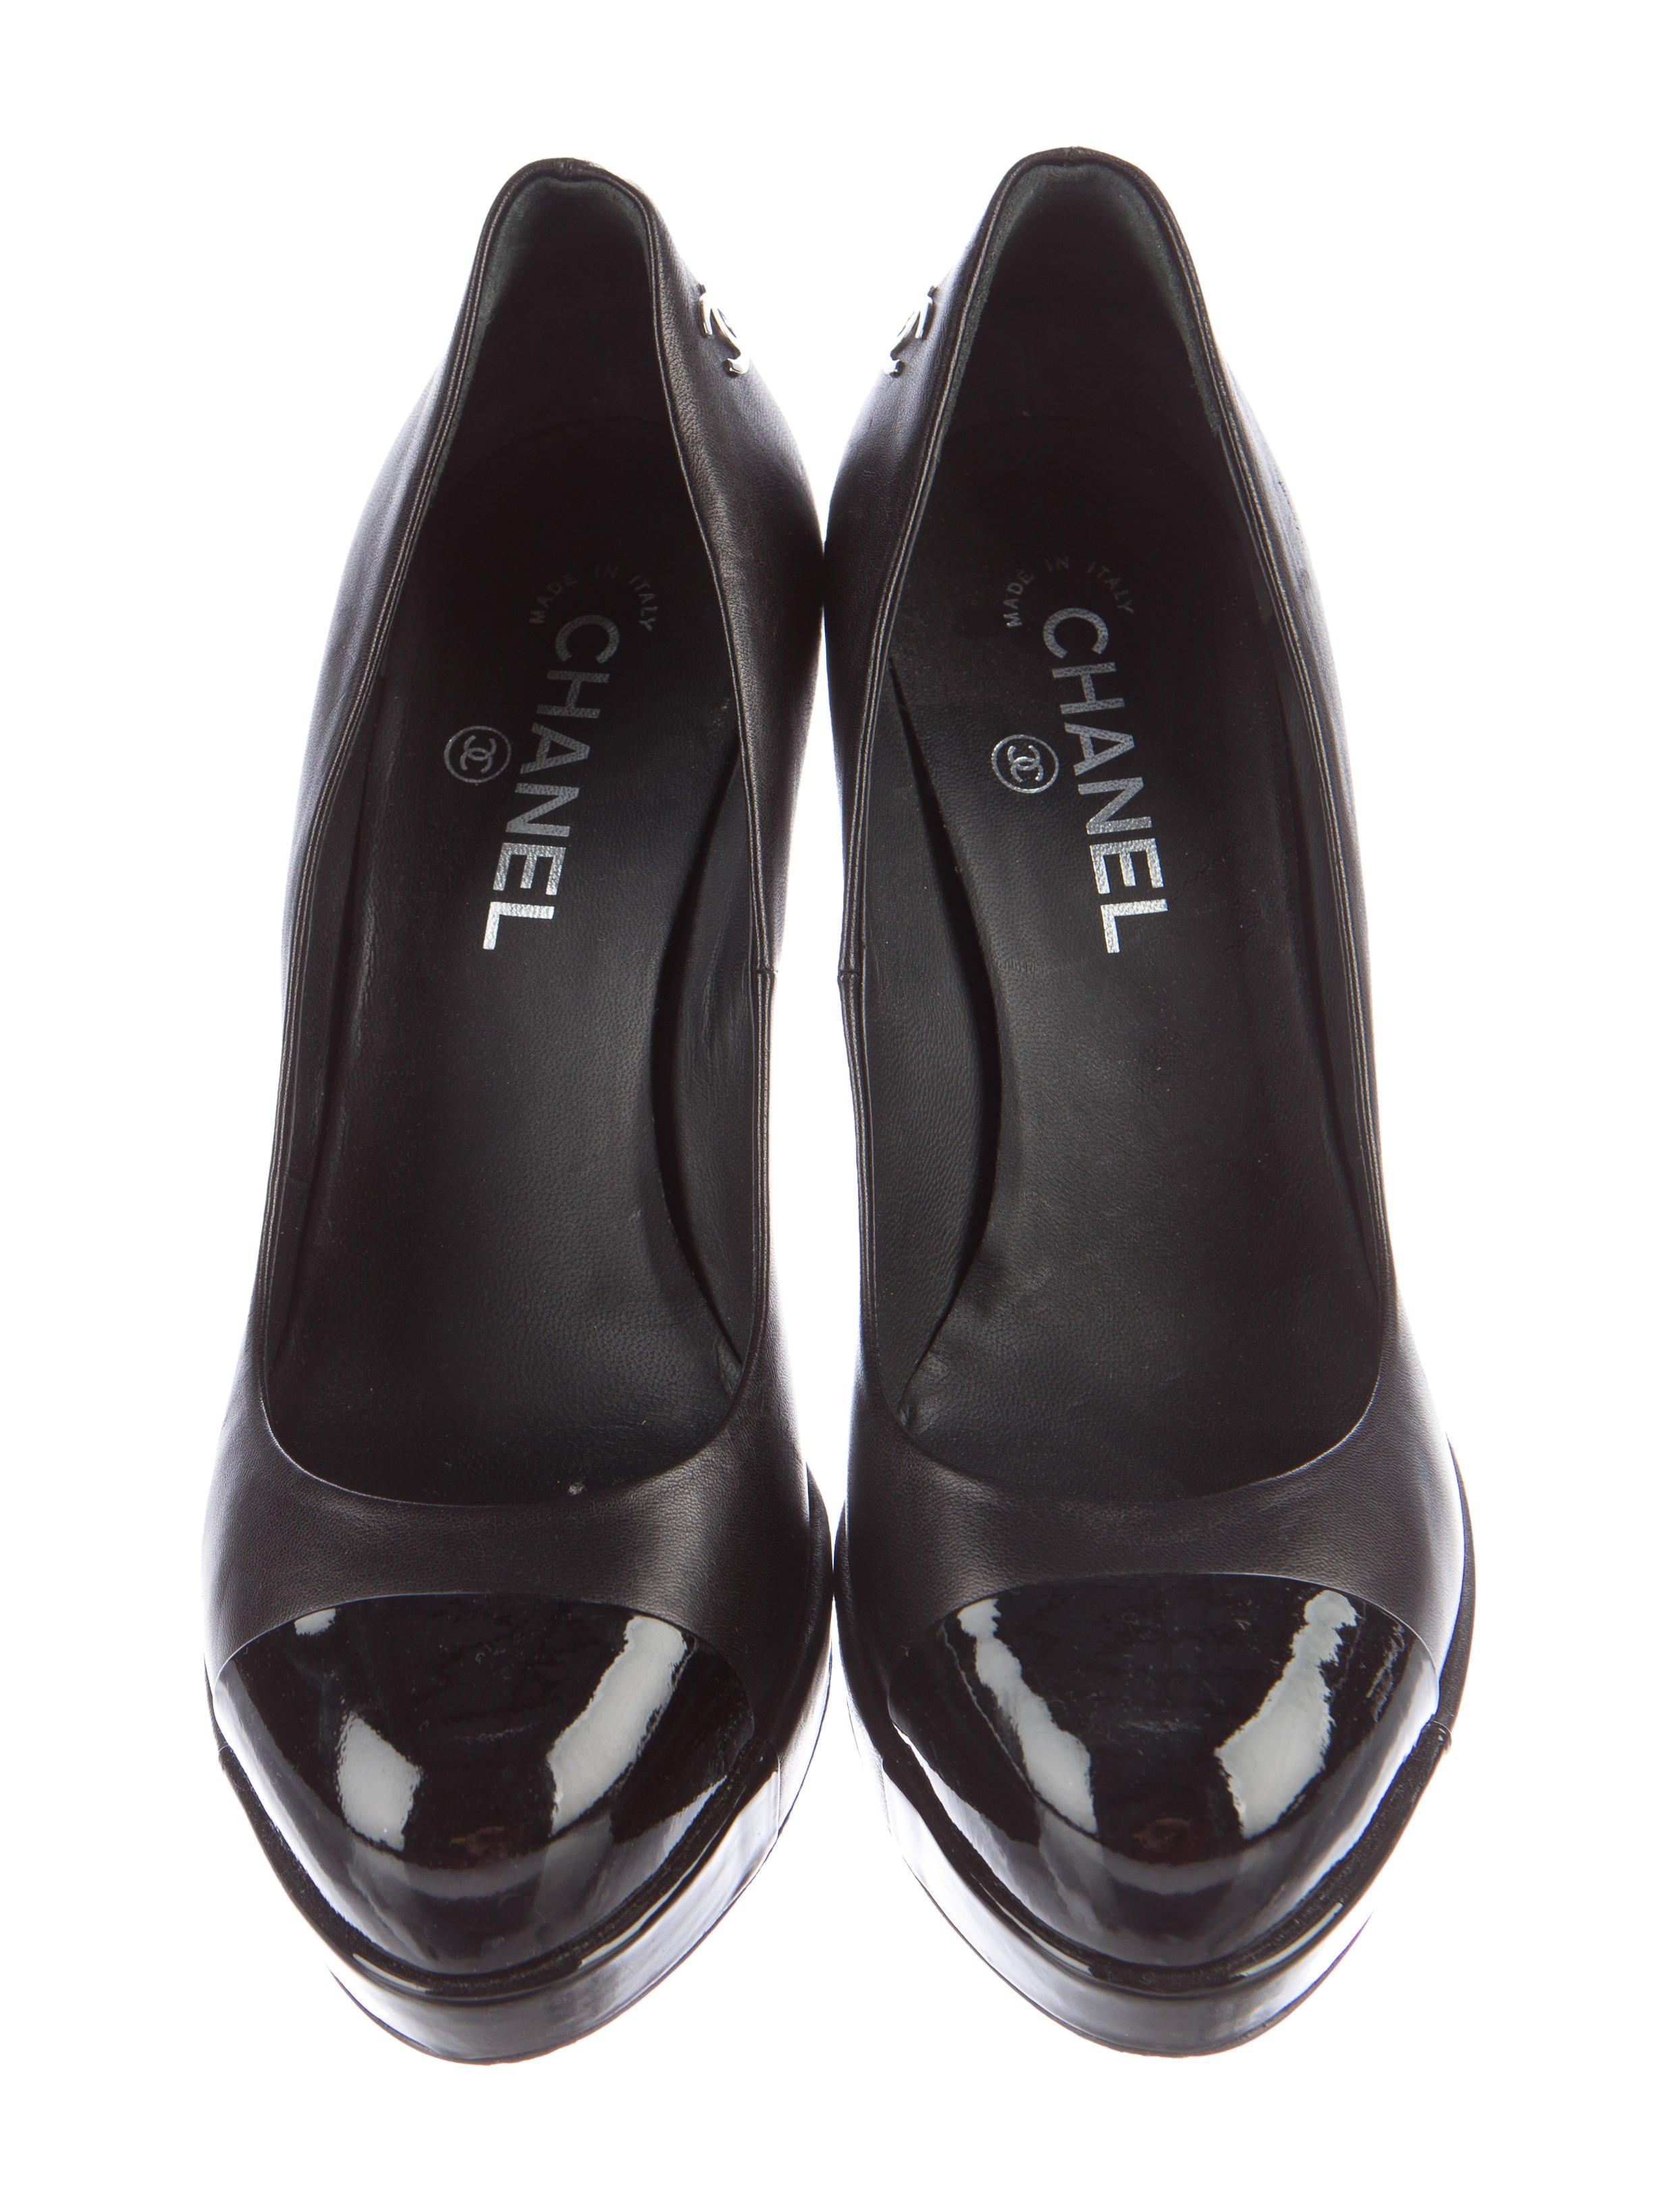 chanel cc platform pumps shoes cha163828 the realreal